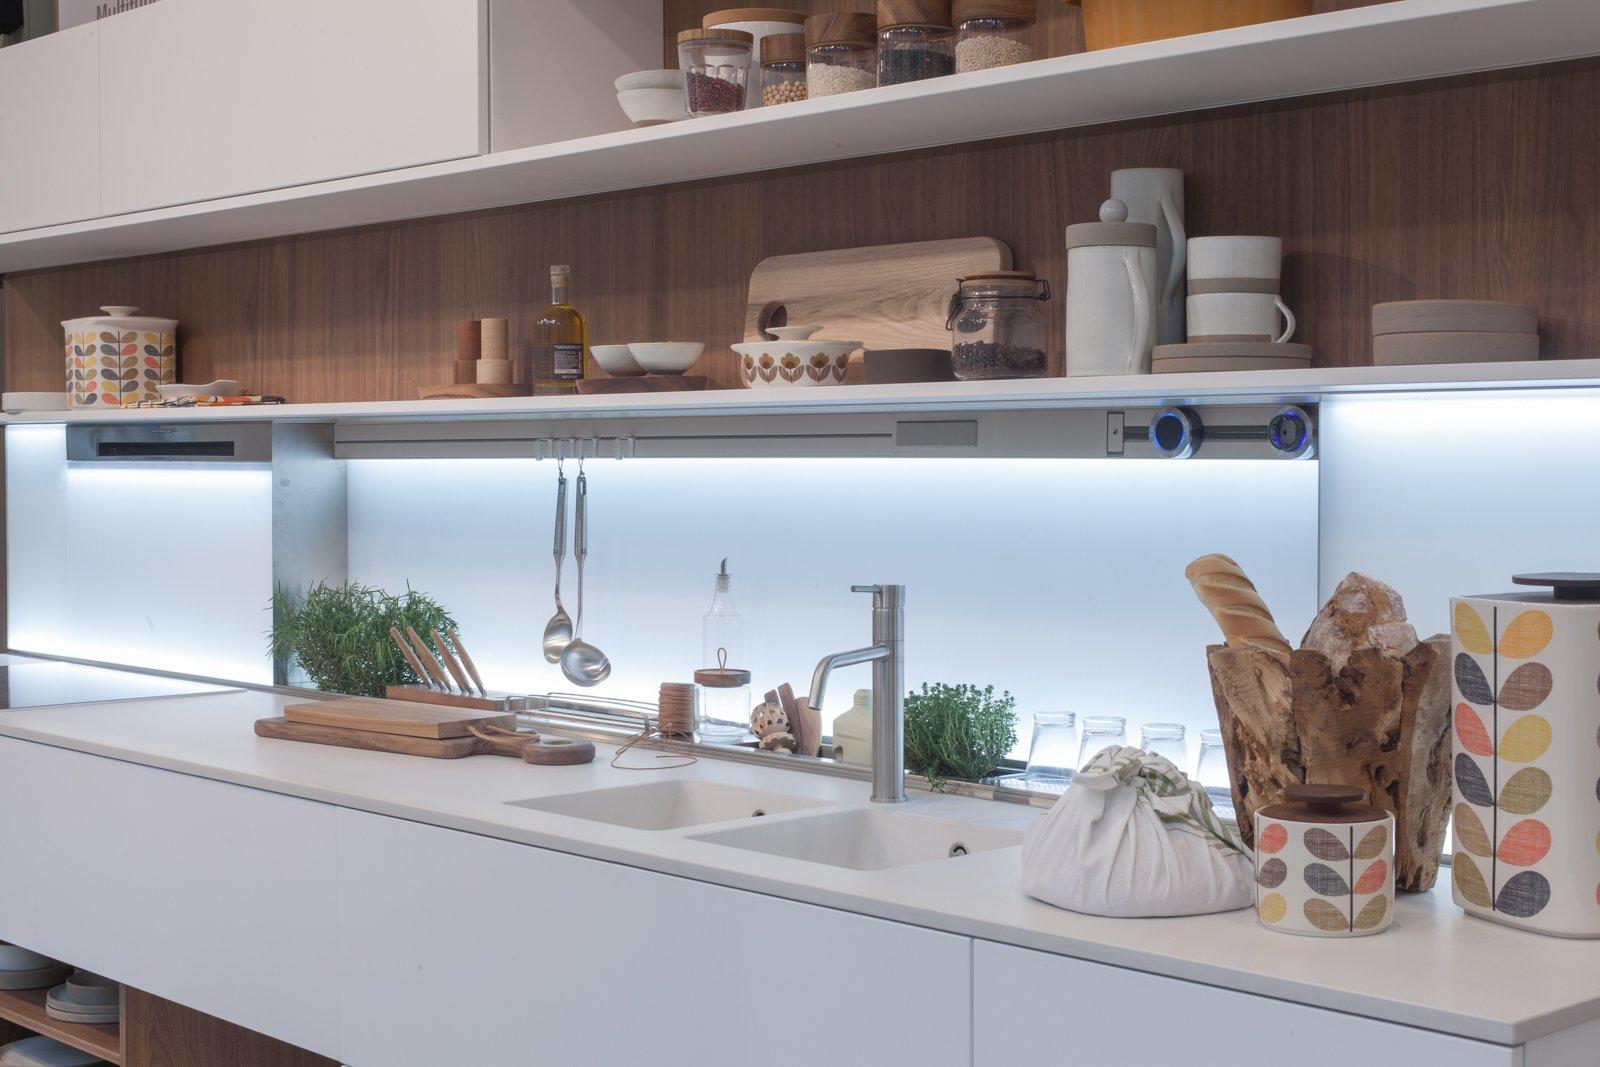 Lavelli Cucina Acciaio Inox Prezzi. Awesome Categorie With ...